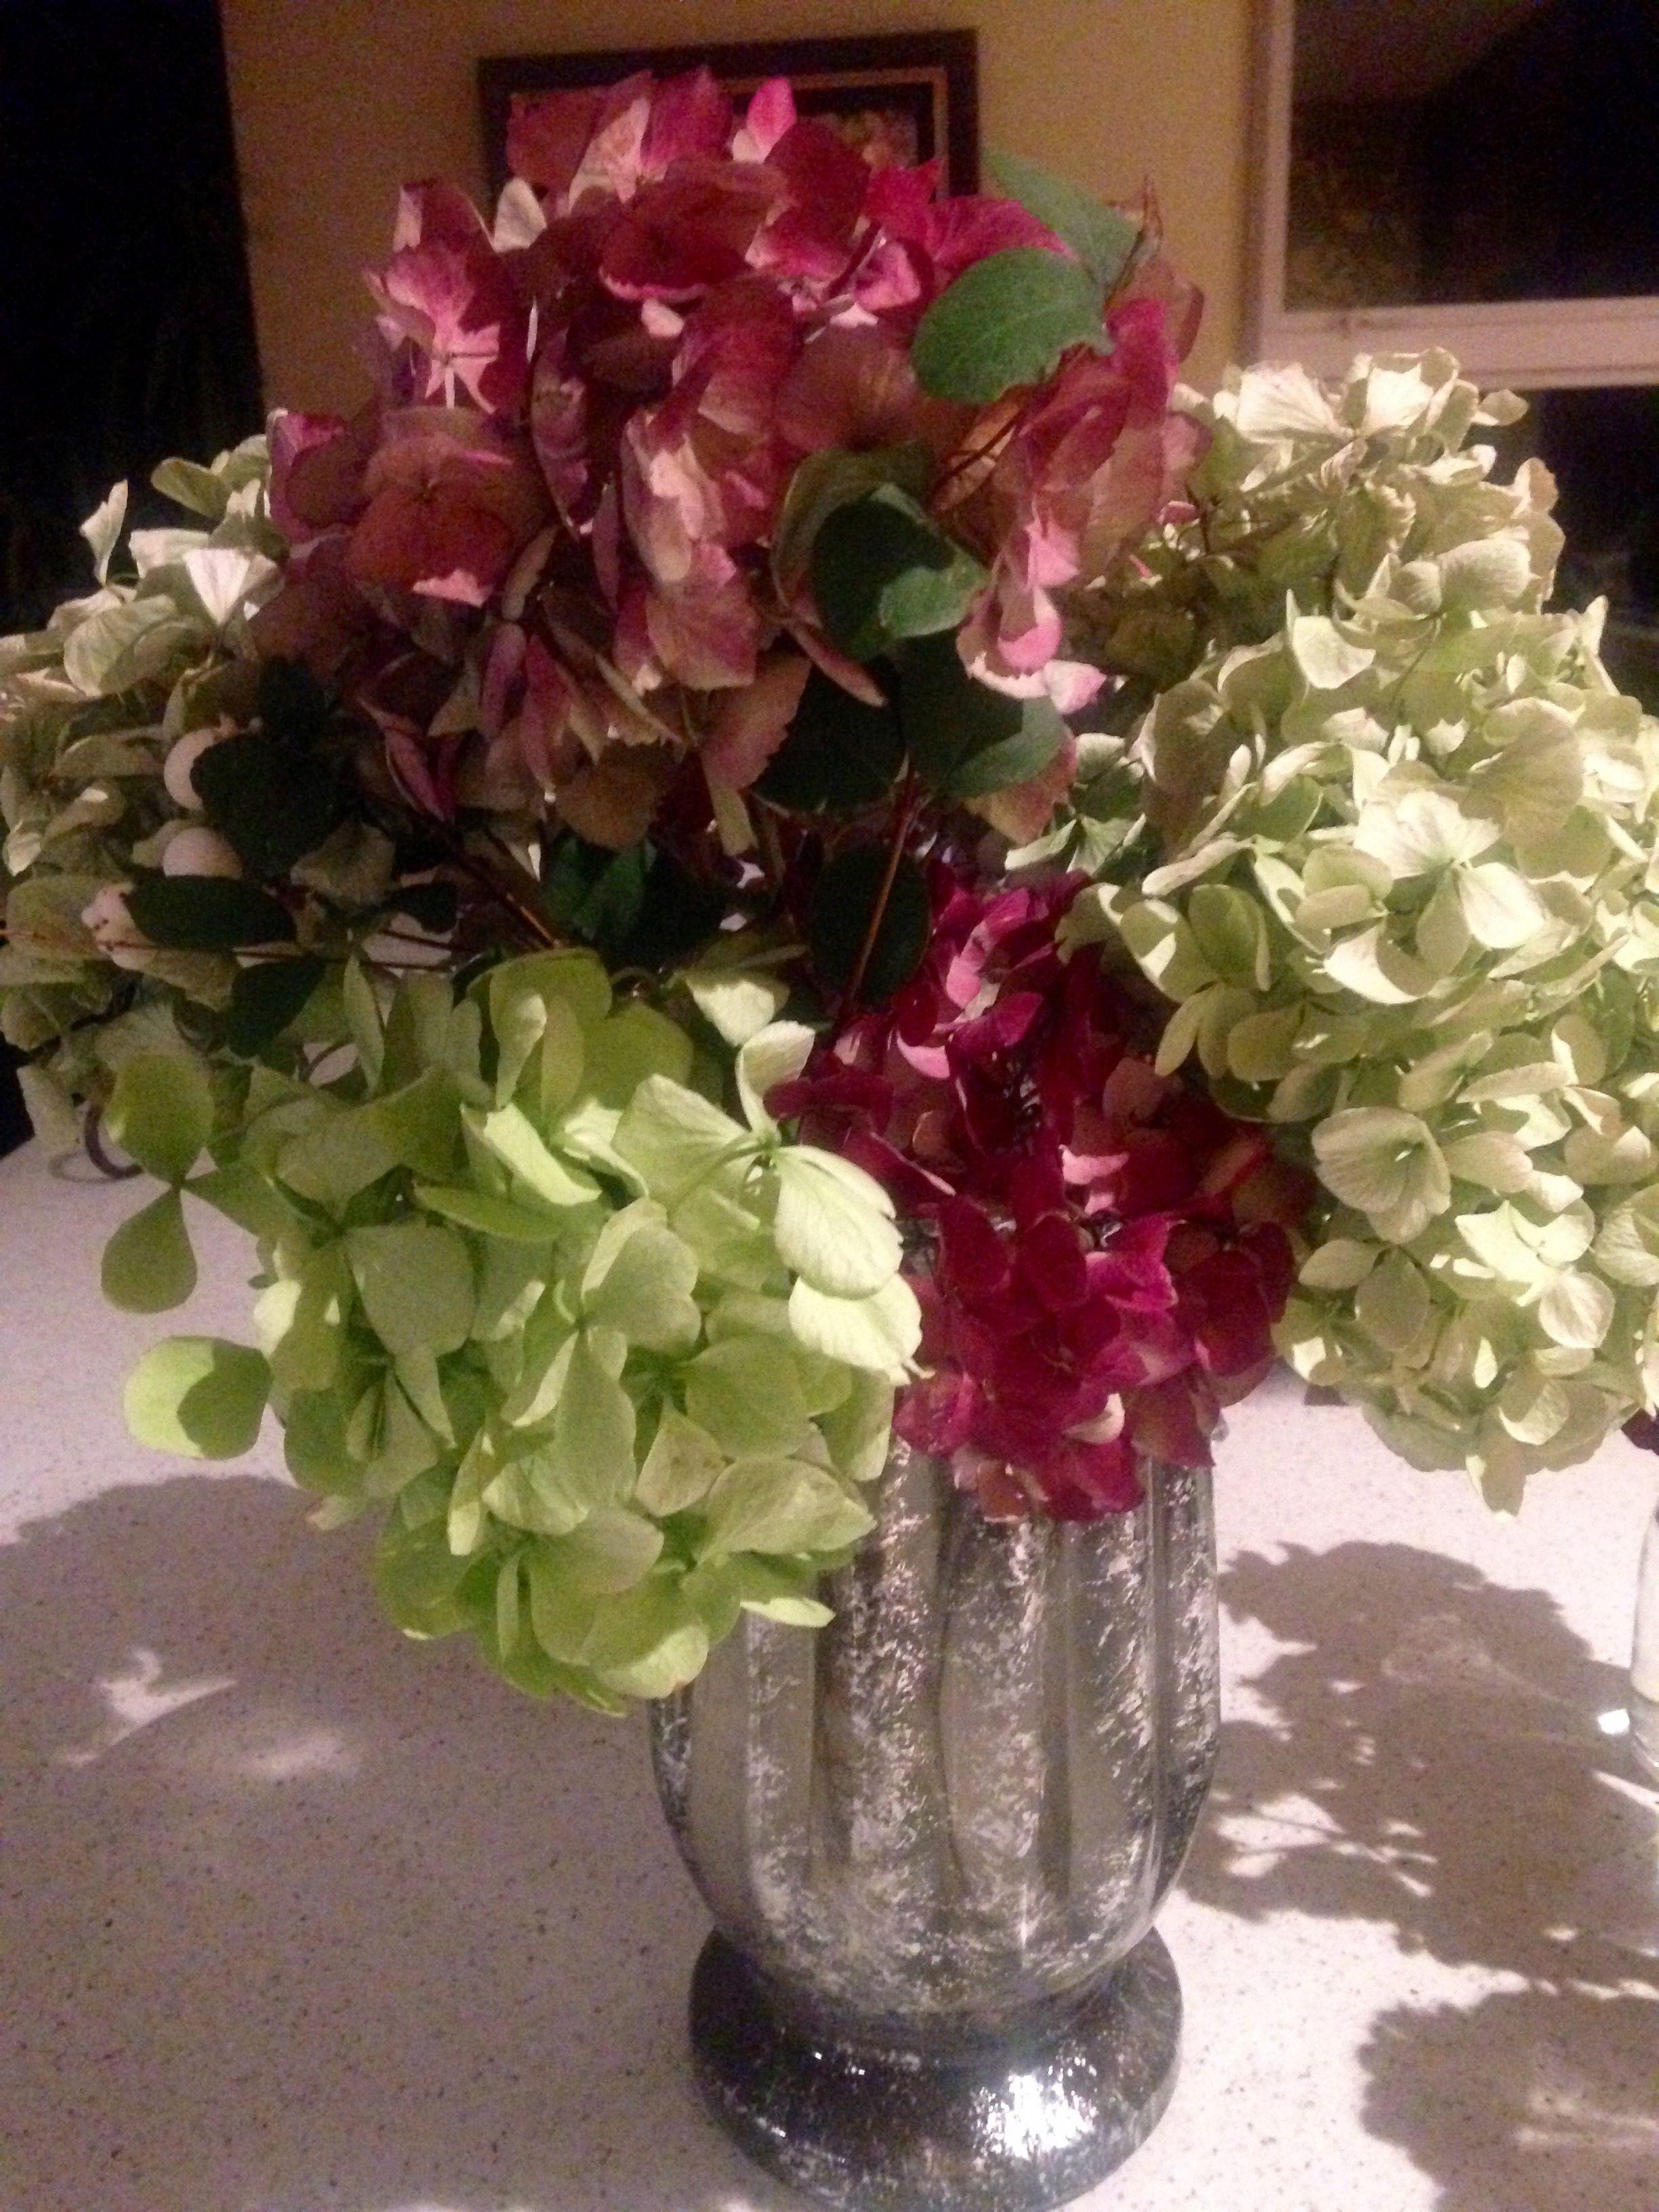 Hydrangeas. I love them.